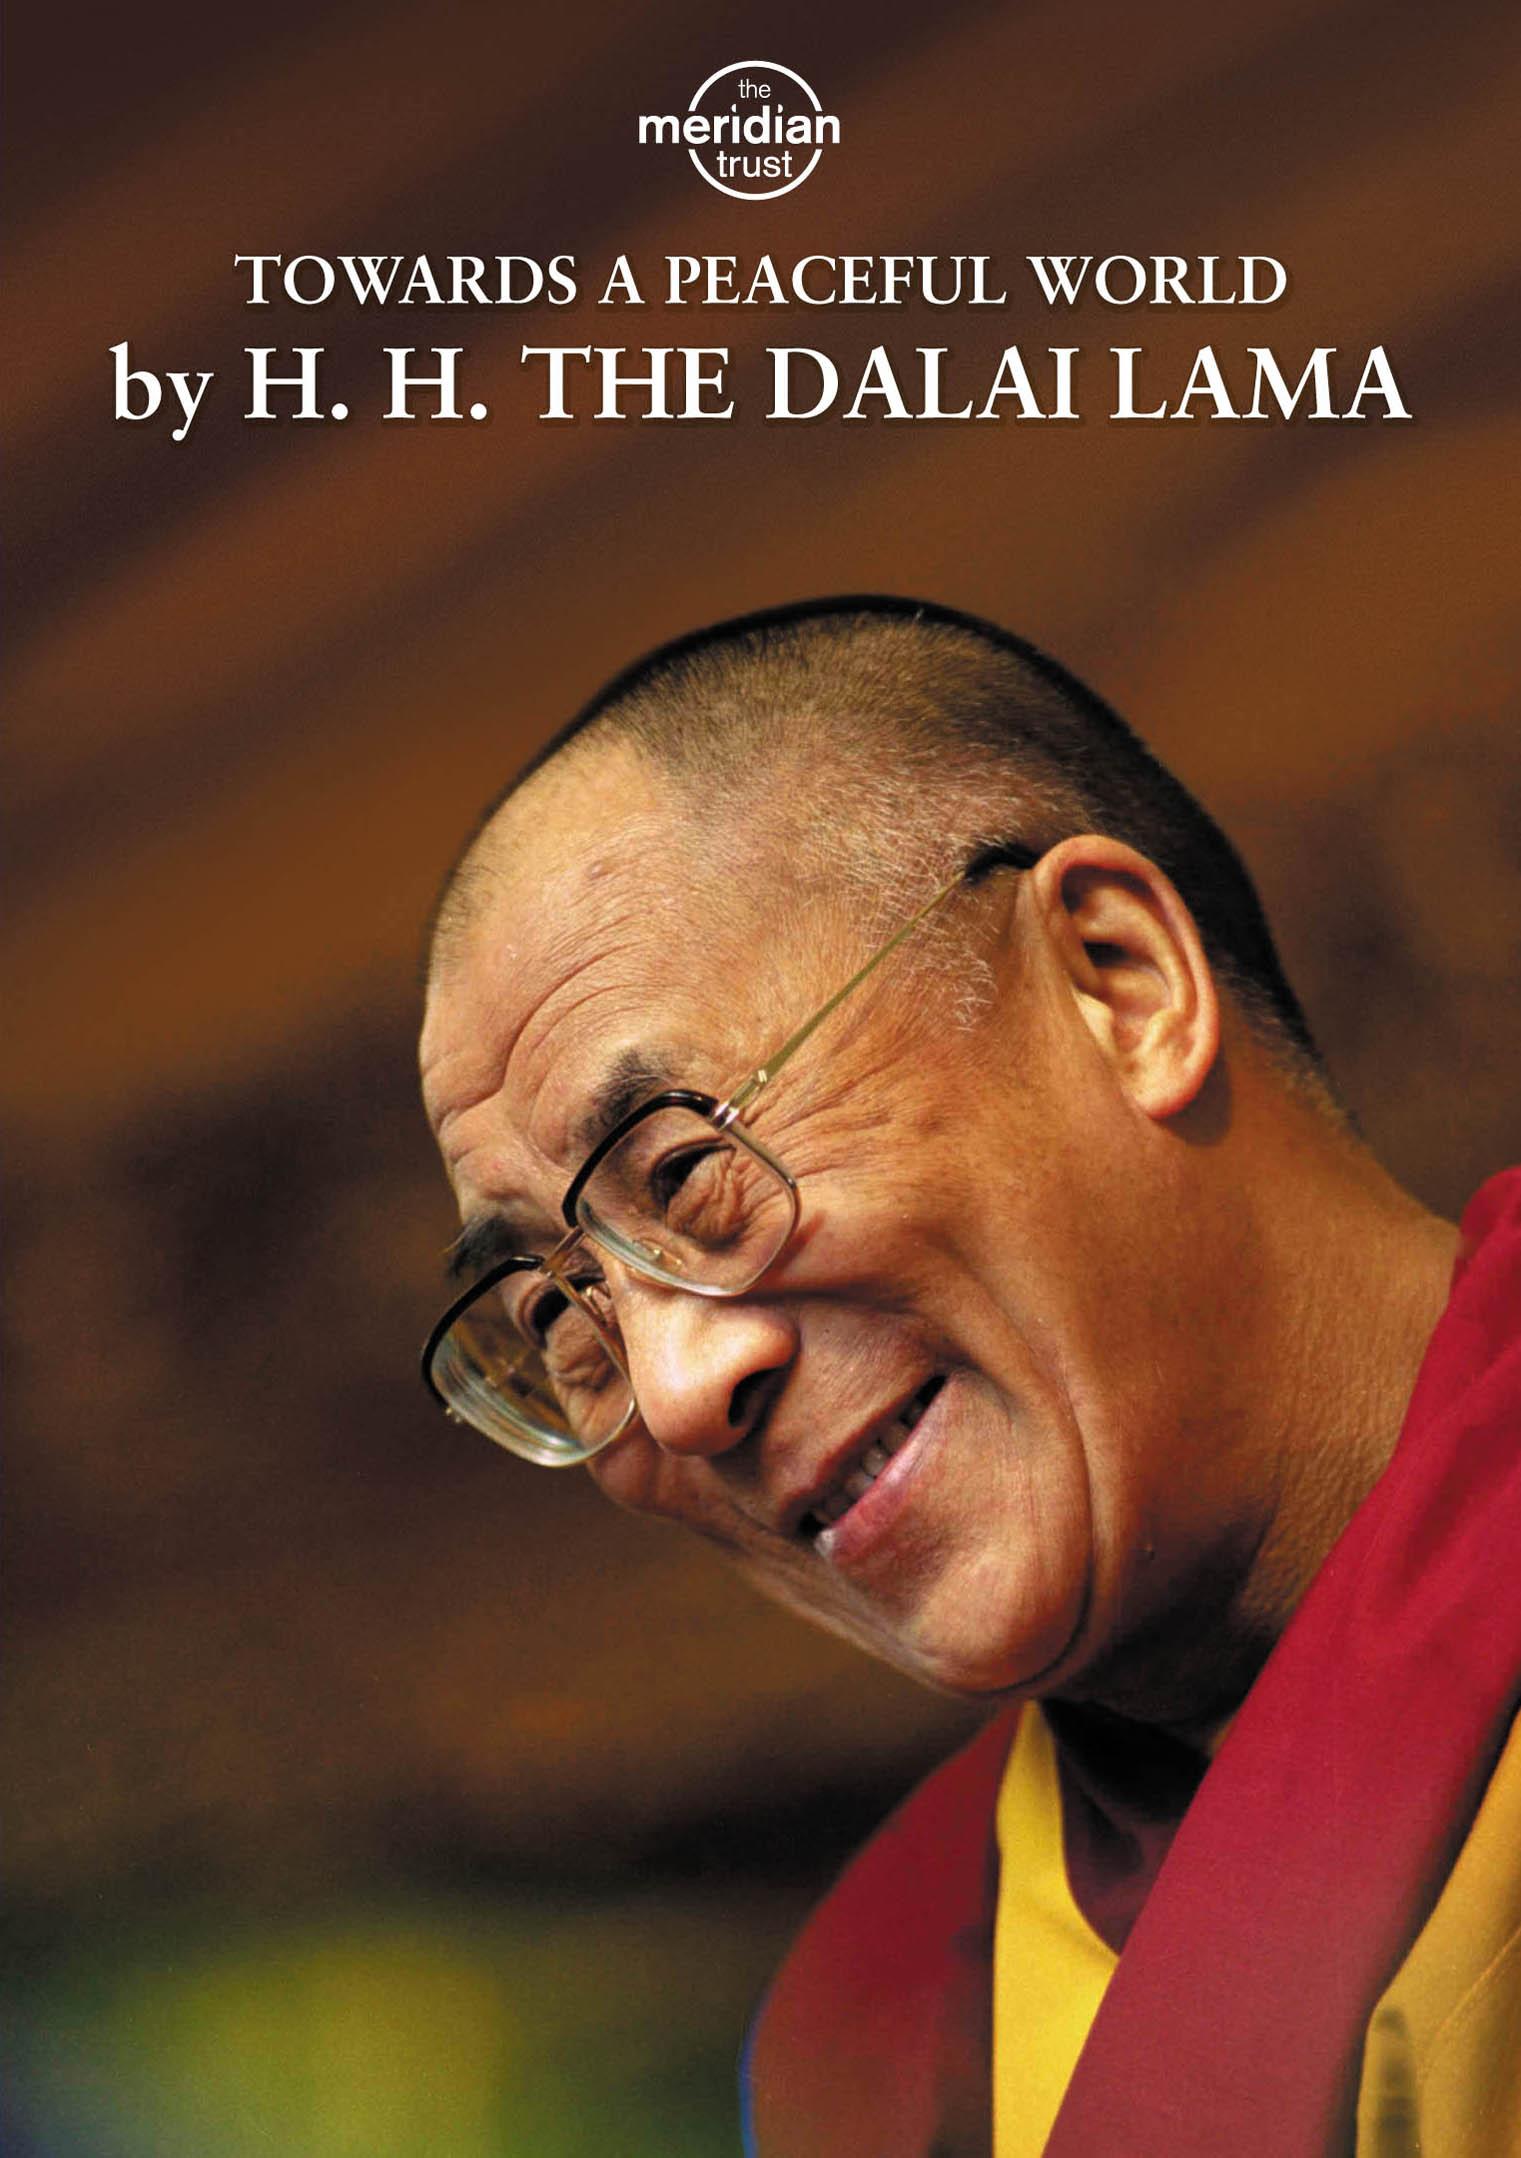 Towards a Peaceful World by H.H. The Dalai Lama